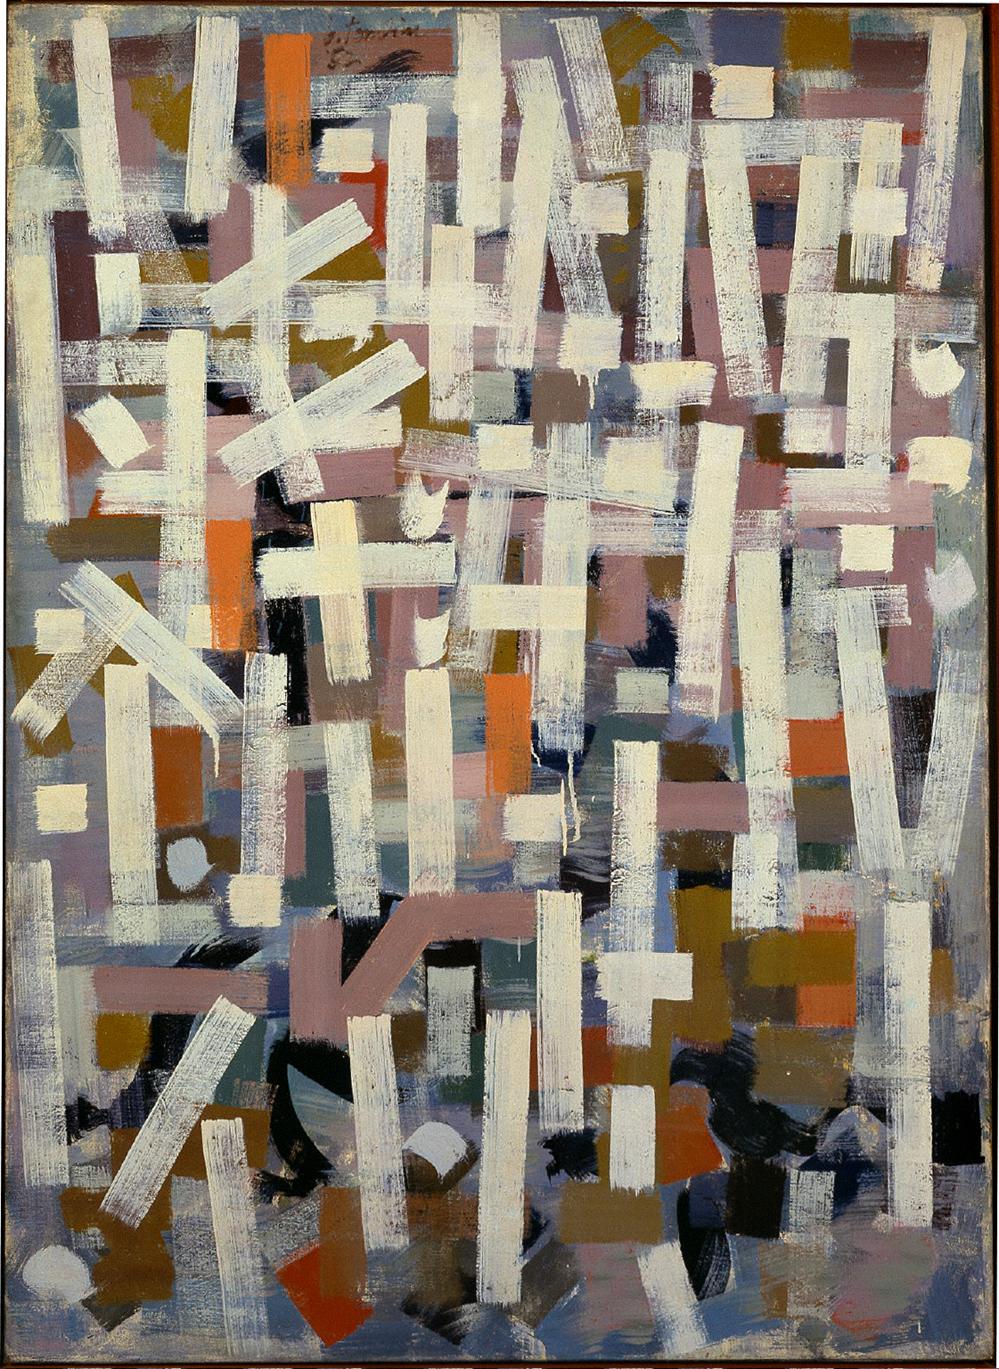 No. 12 (1952). Bradley Walker Tomlin. Oil on canvas